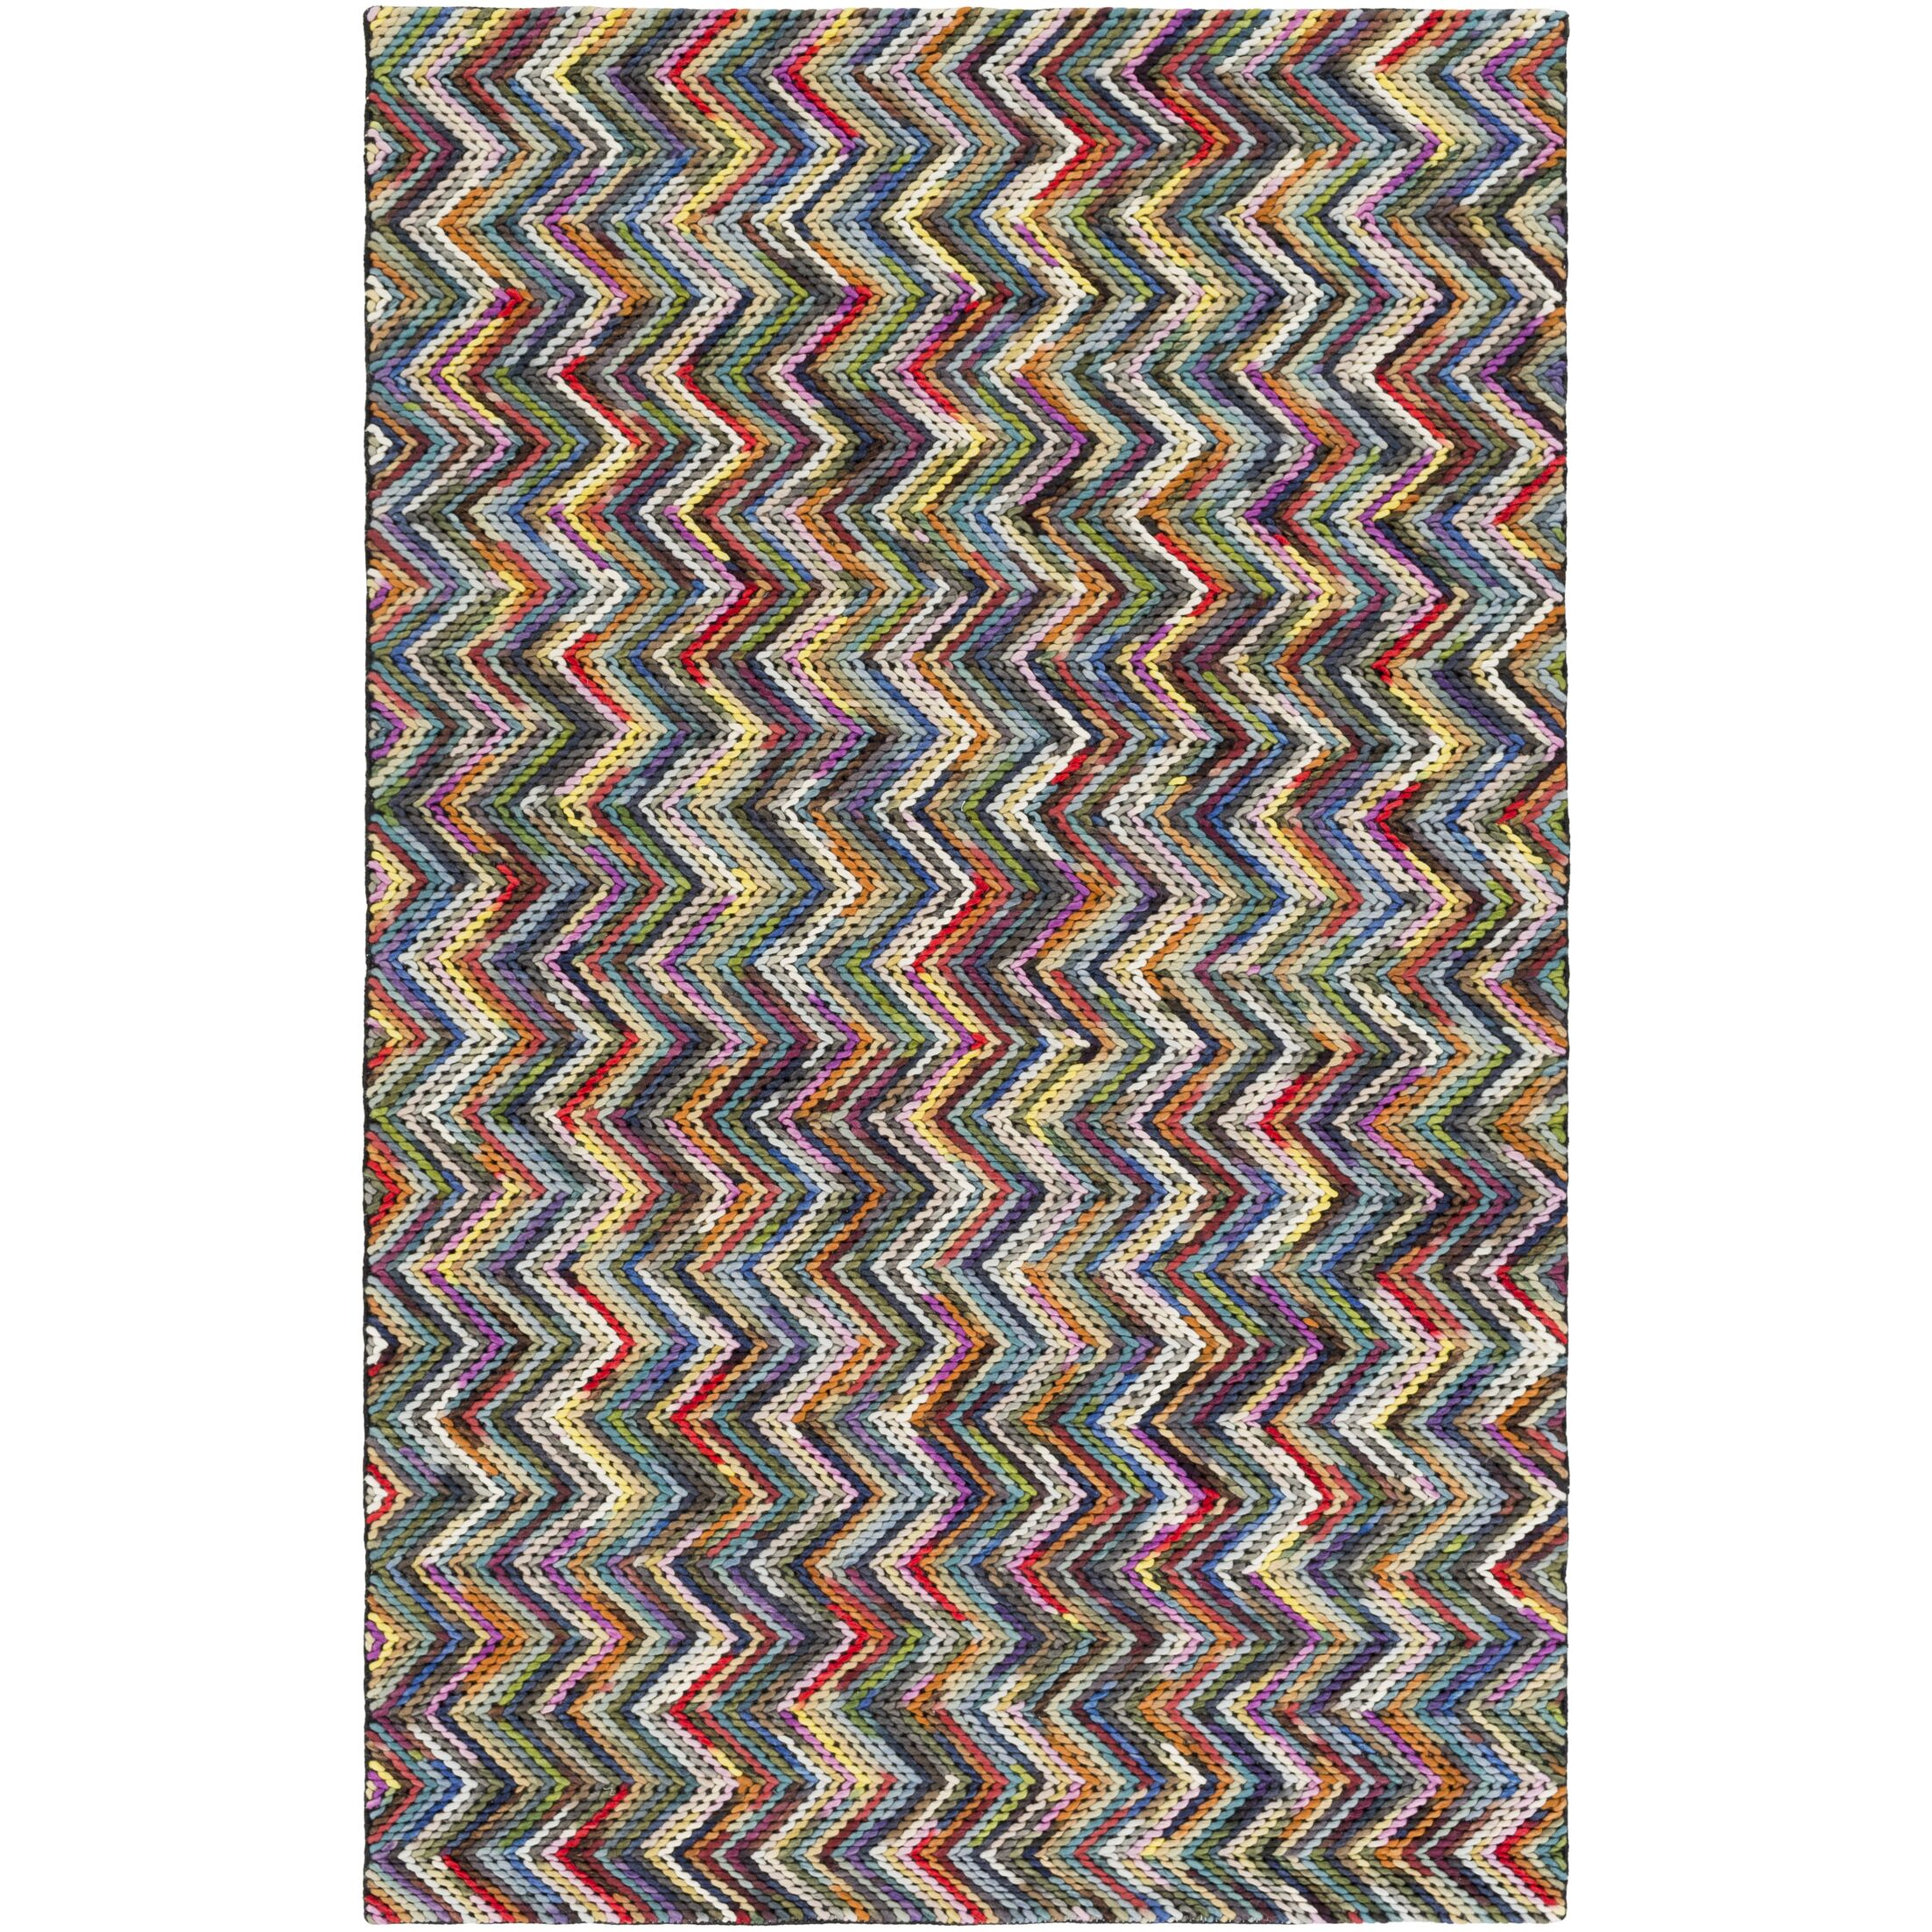 Ines Hand-Woven Area Rug Rug Size: Rectangle 8' x 10'